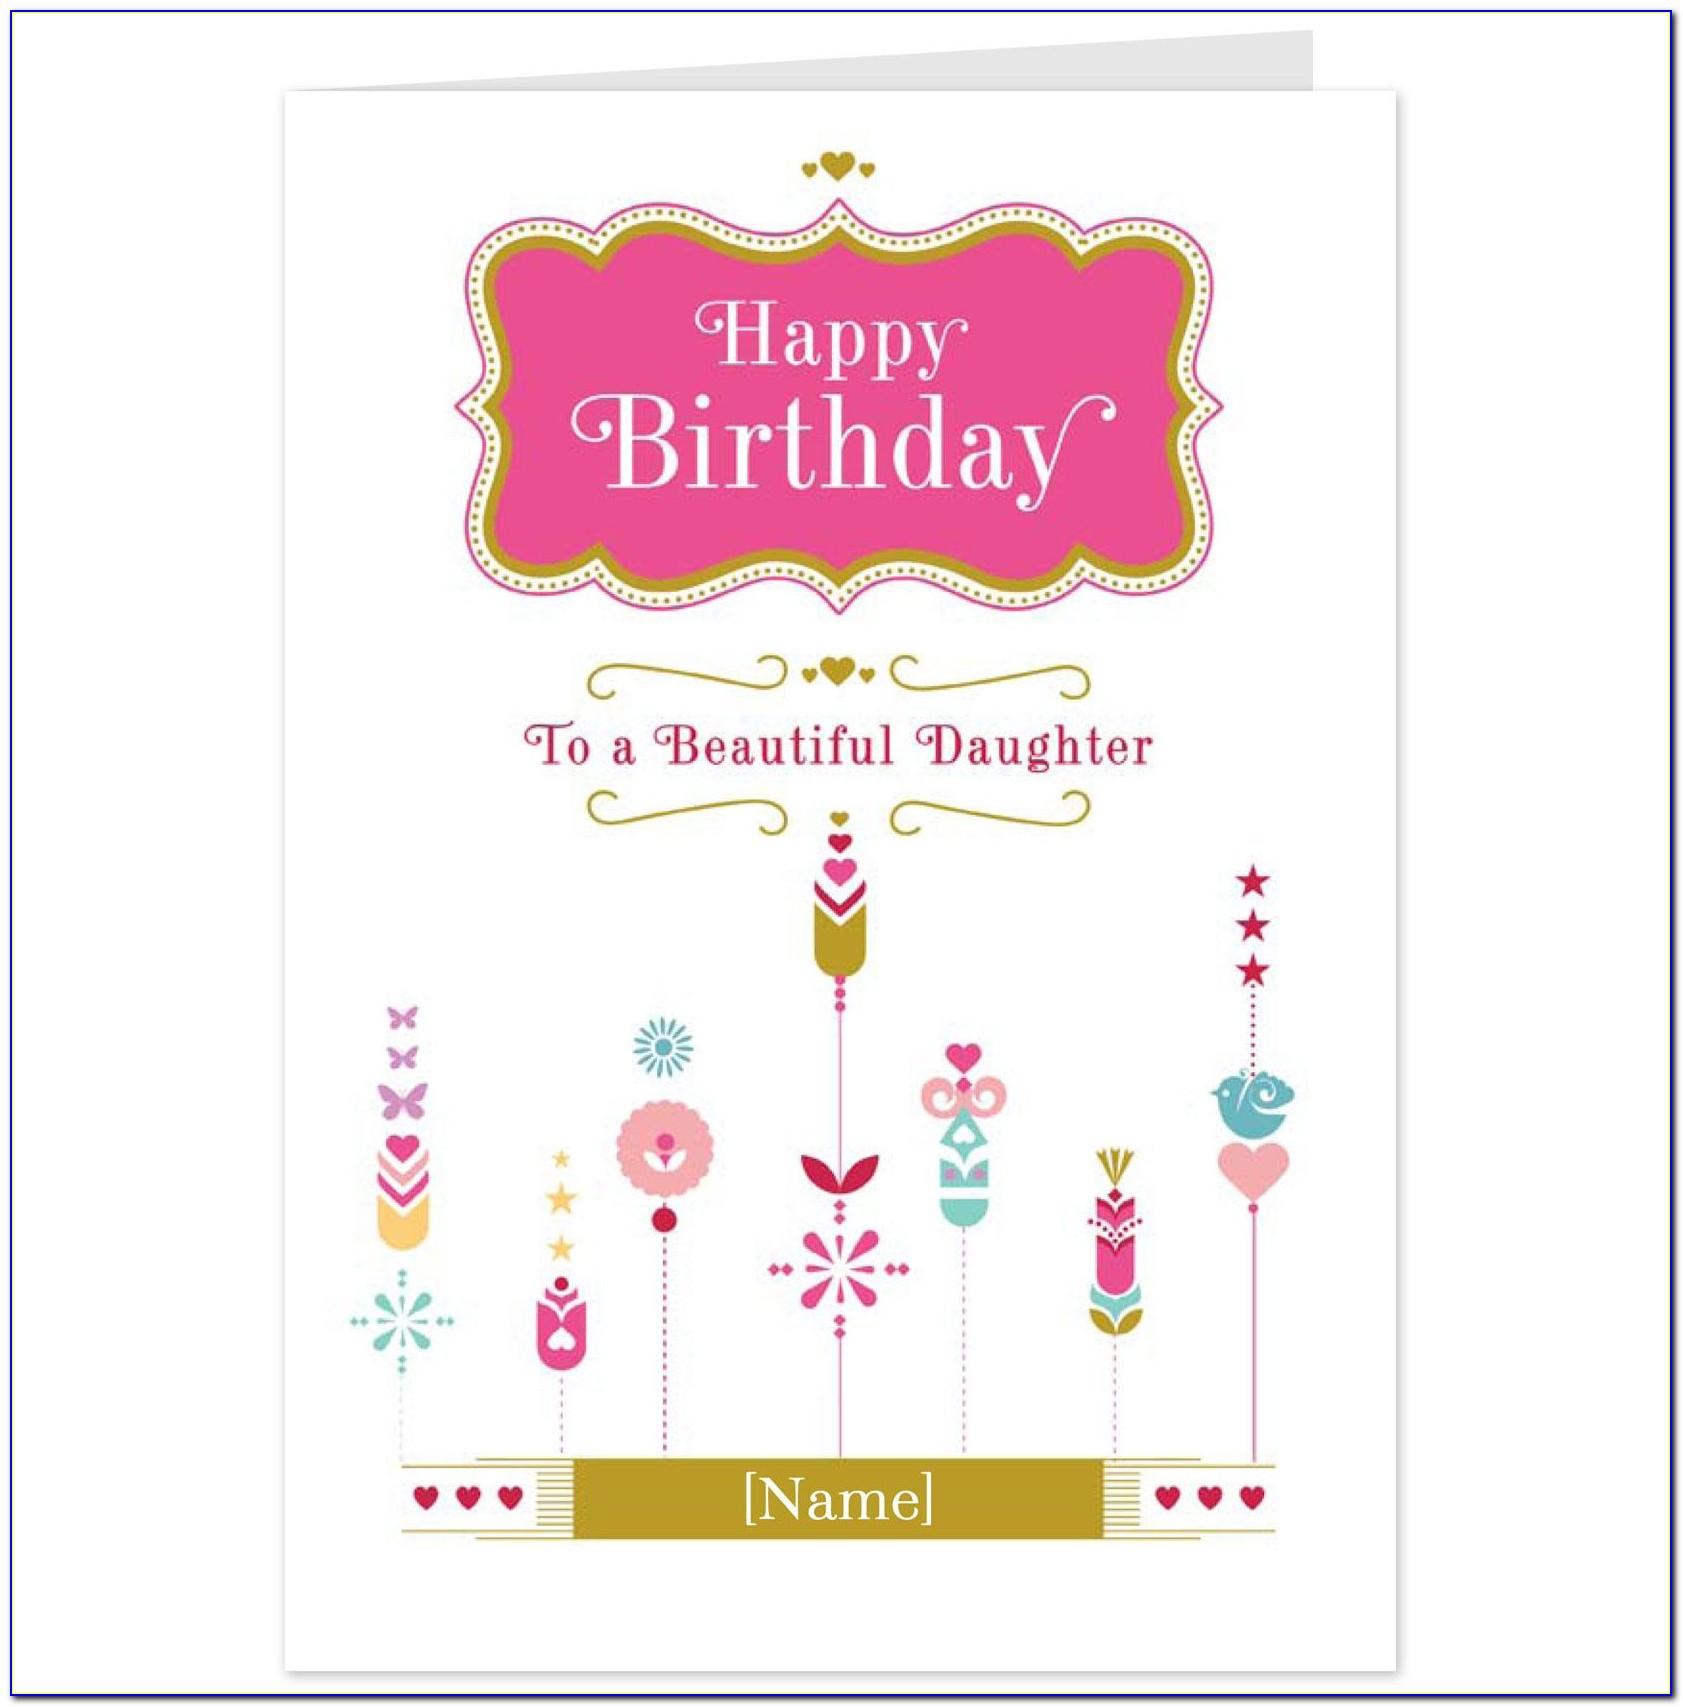 Hallmark Printable Birthday Invitations